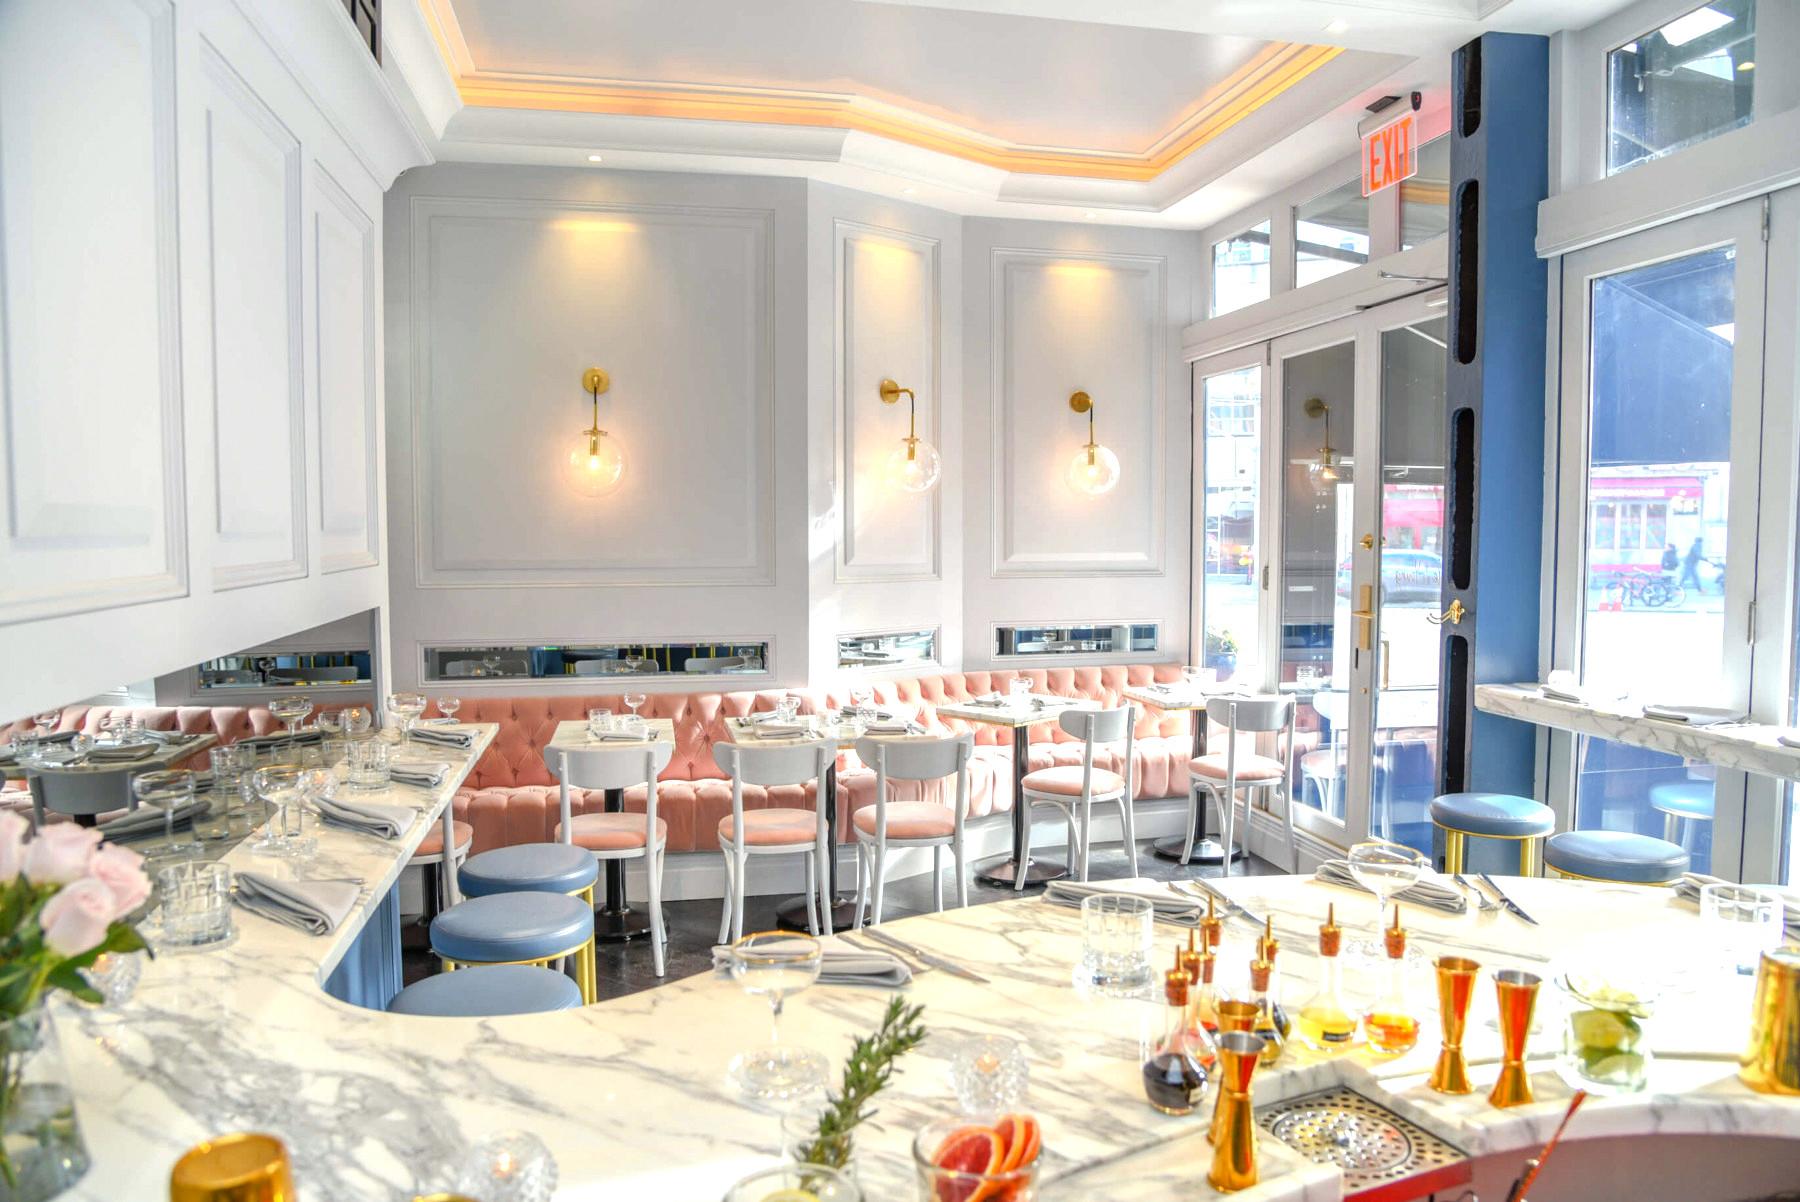 instagramable nyc, instagramable new york, west village restaurants, best nyc restaurants